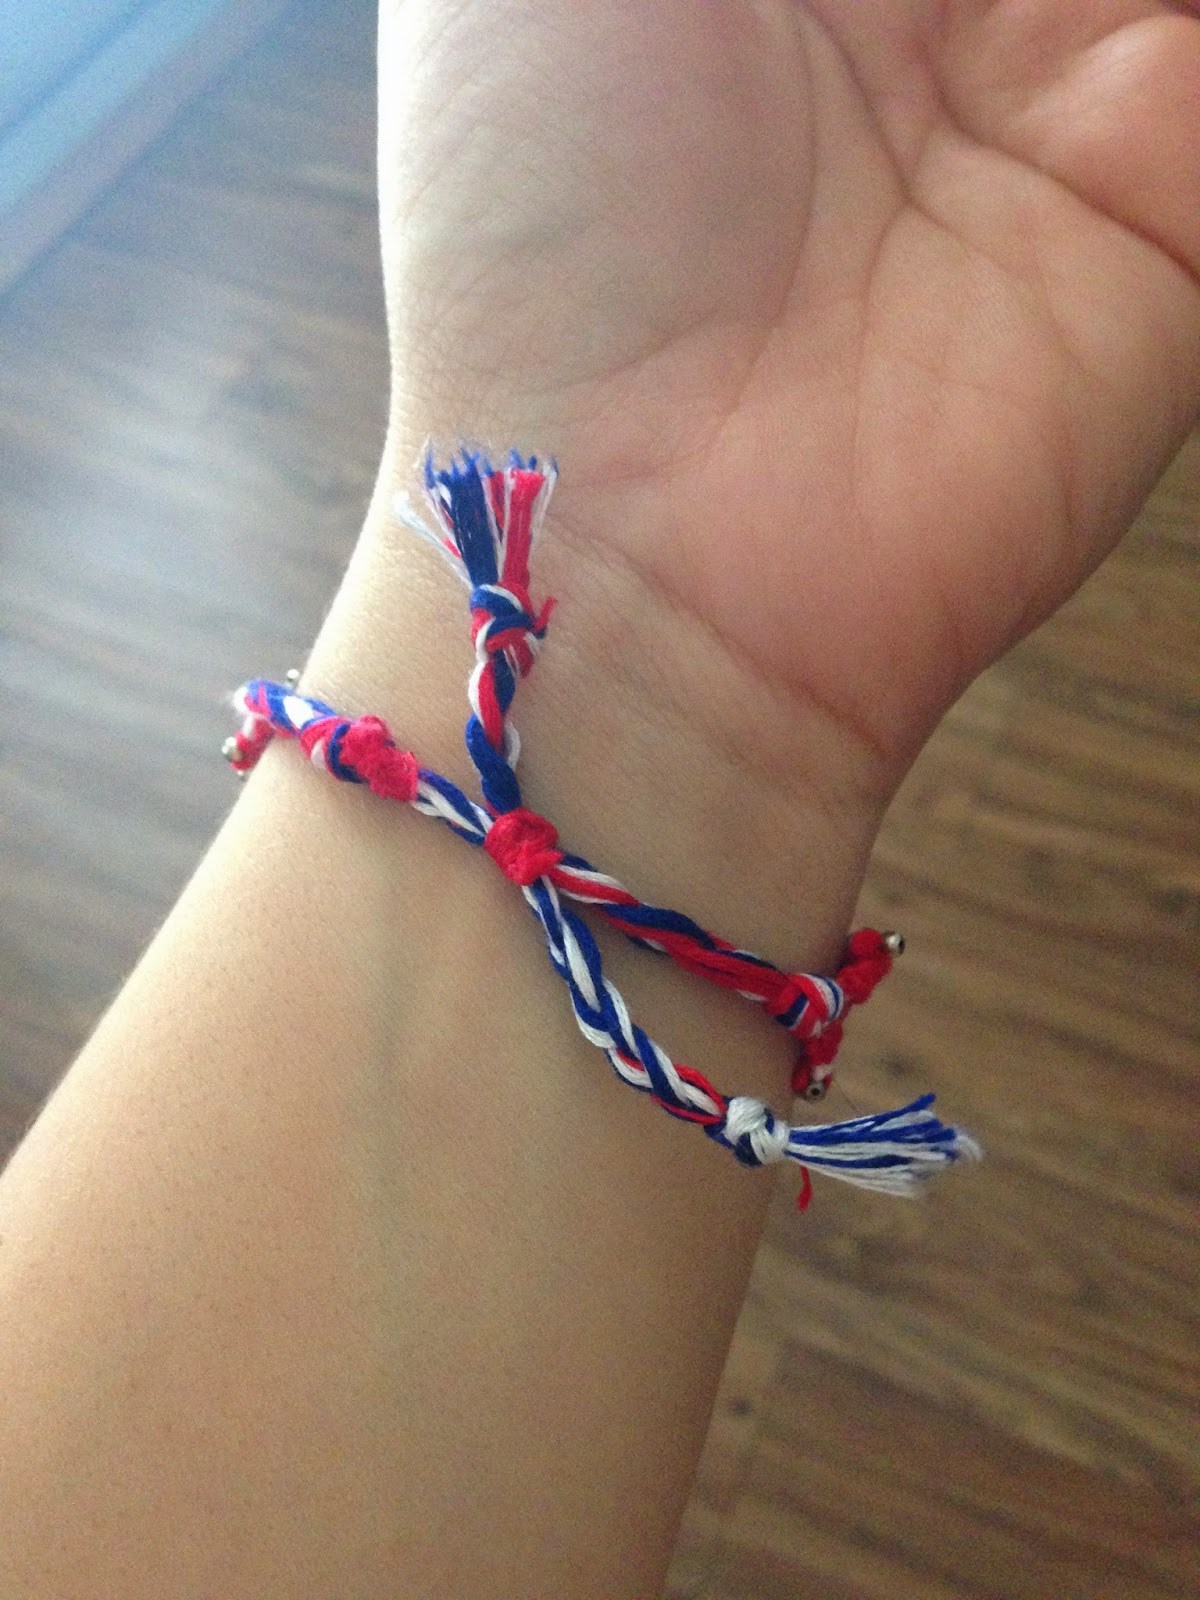 How to tie a friendship bracelet